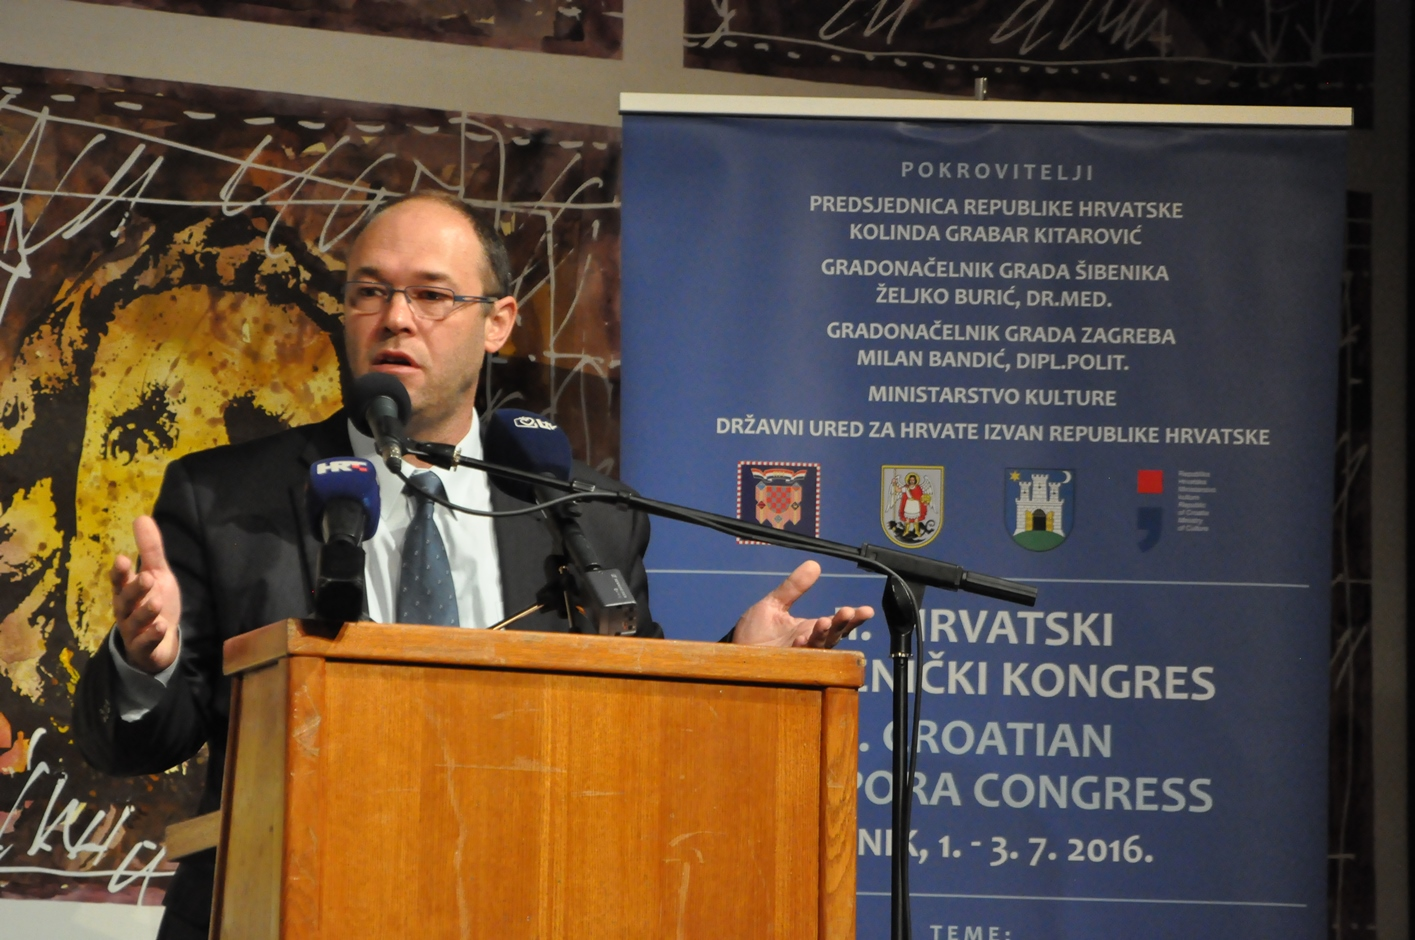 http://www.crodnevnik.de/crodnevnik/wp-content/uploads/2016/07/Hrv-iselj-kongres-Sibenik-2.jpg